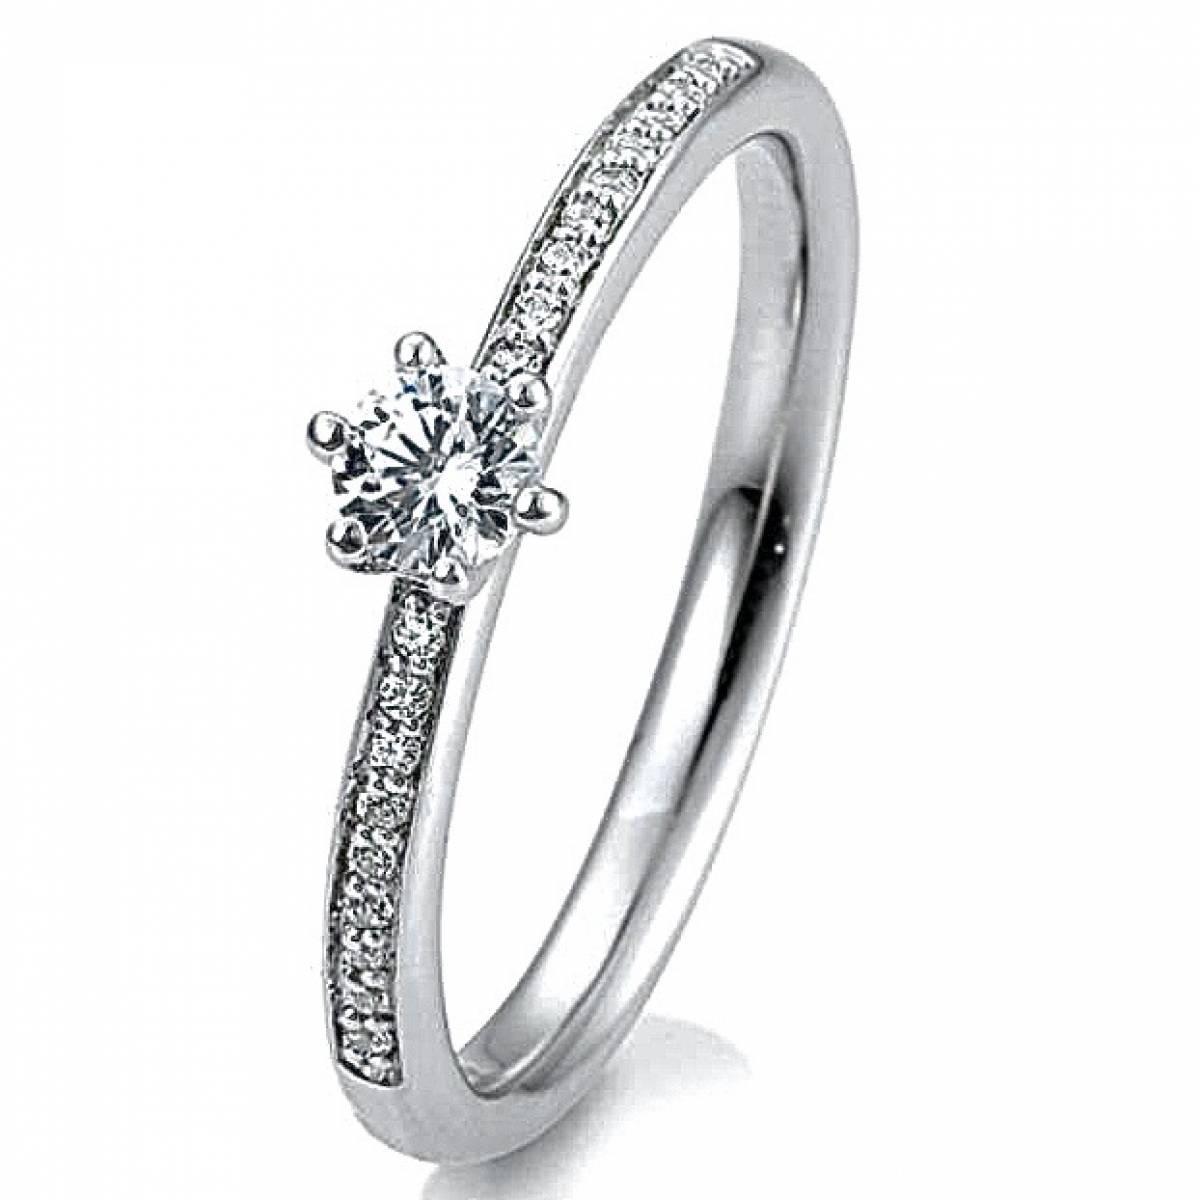 Anel de Noivado Ouro Branco, de 19,2 kts com Diamantes ou Zircónias